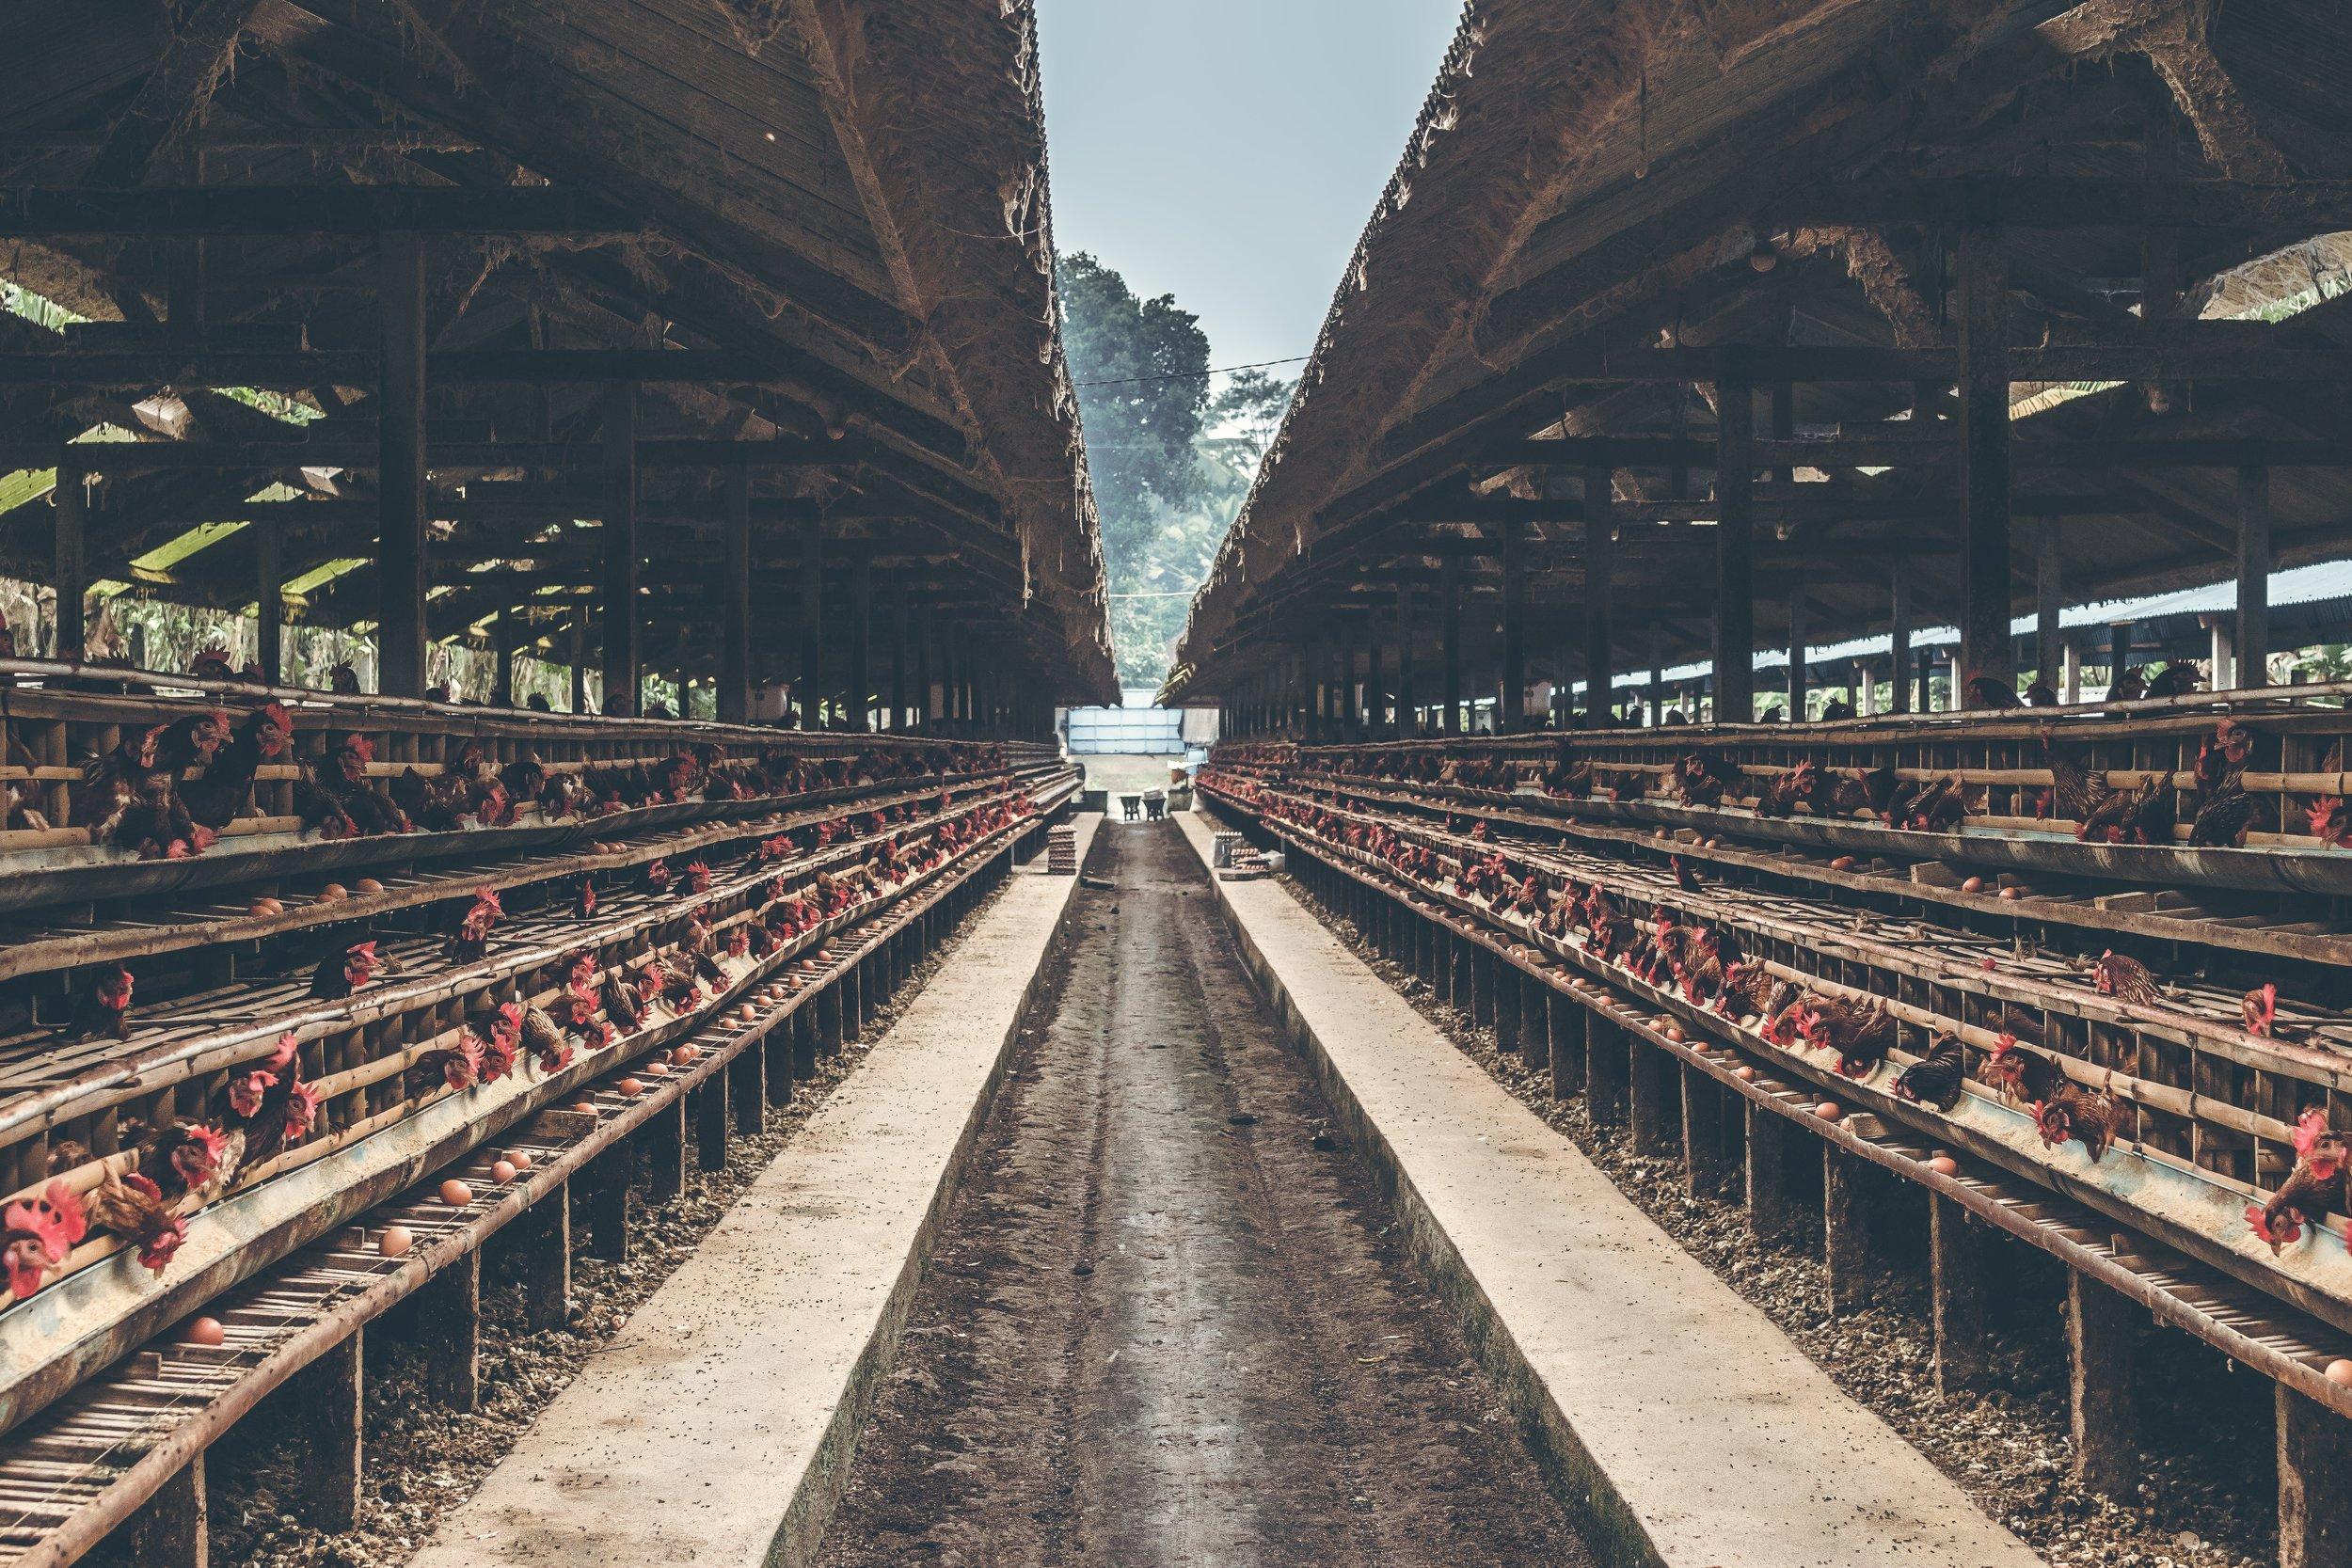 animals-building-chickens-1467711.jpg